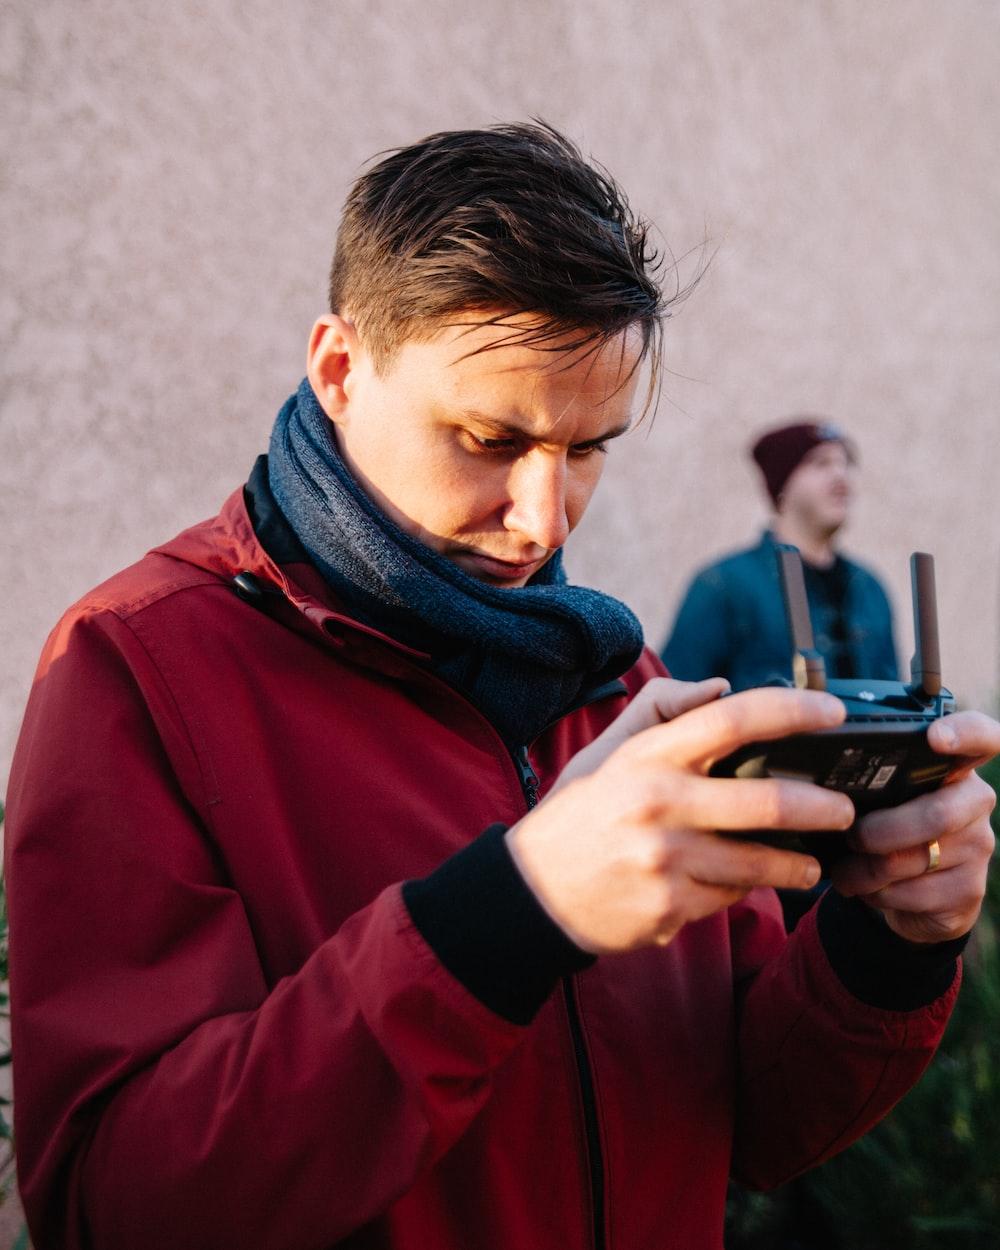 man using black camera